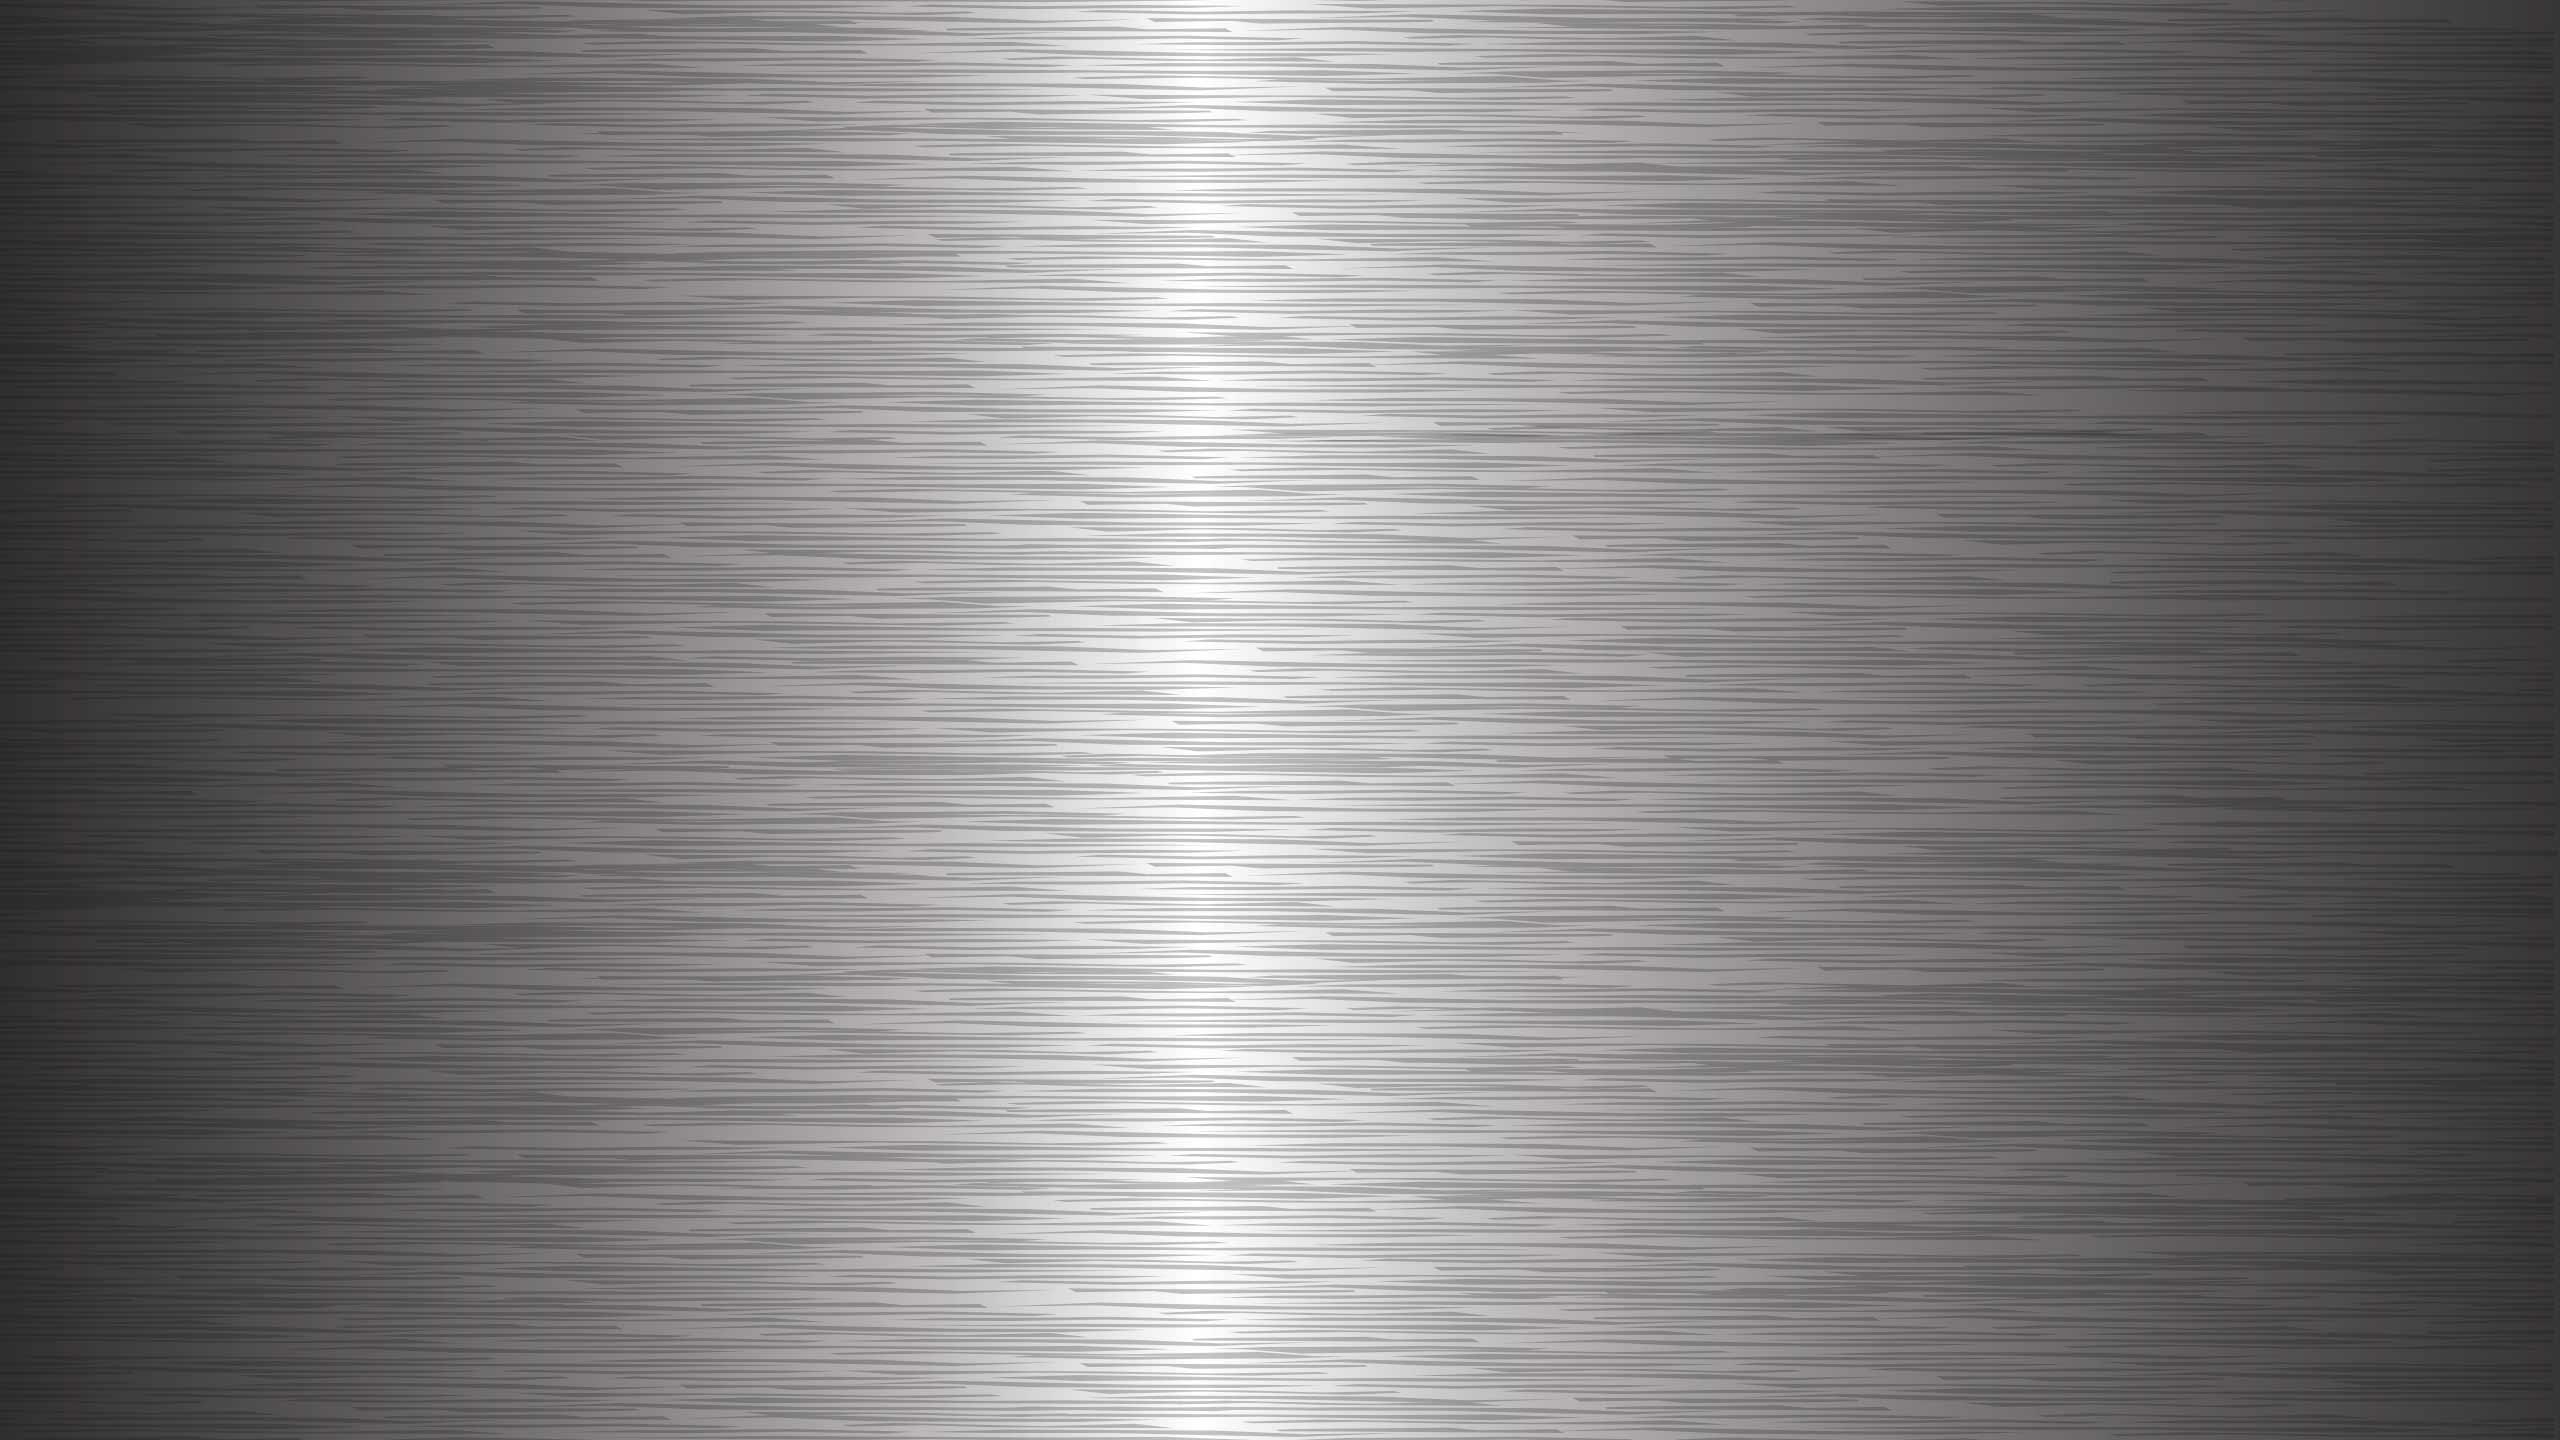 Free Chrome Backgrounds - WallpaperSafari